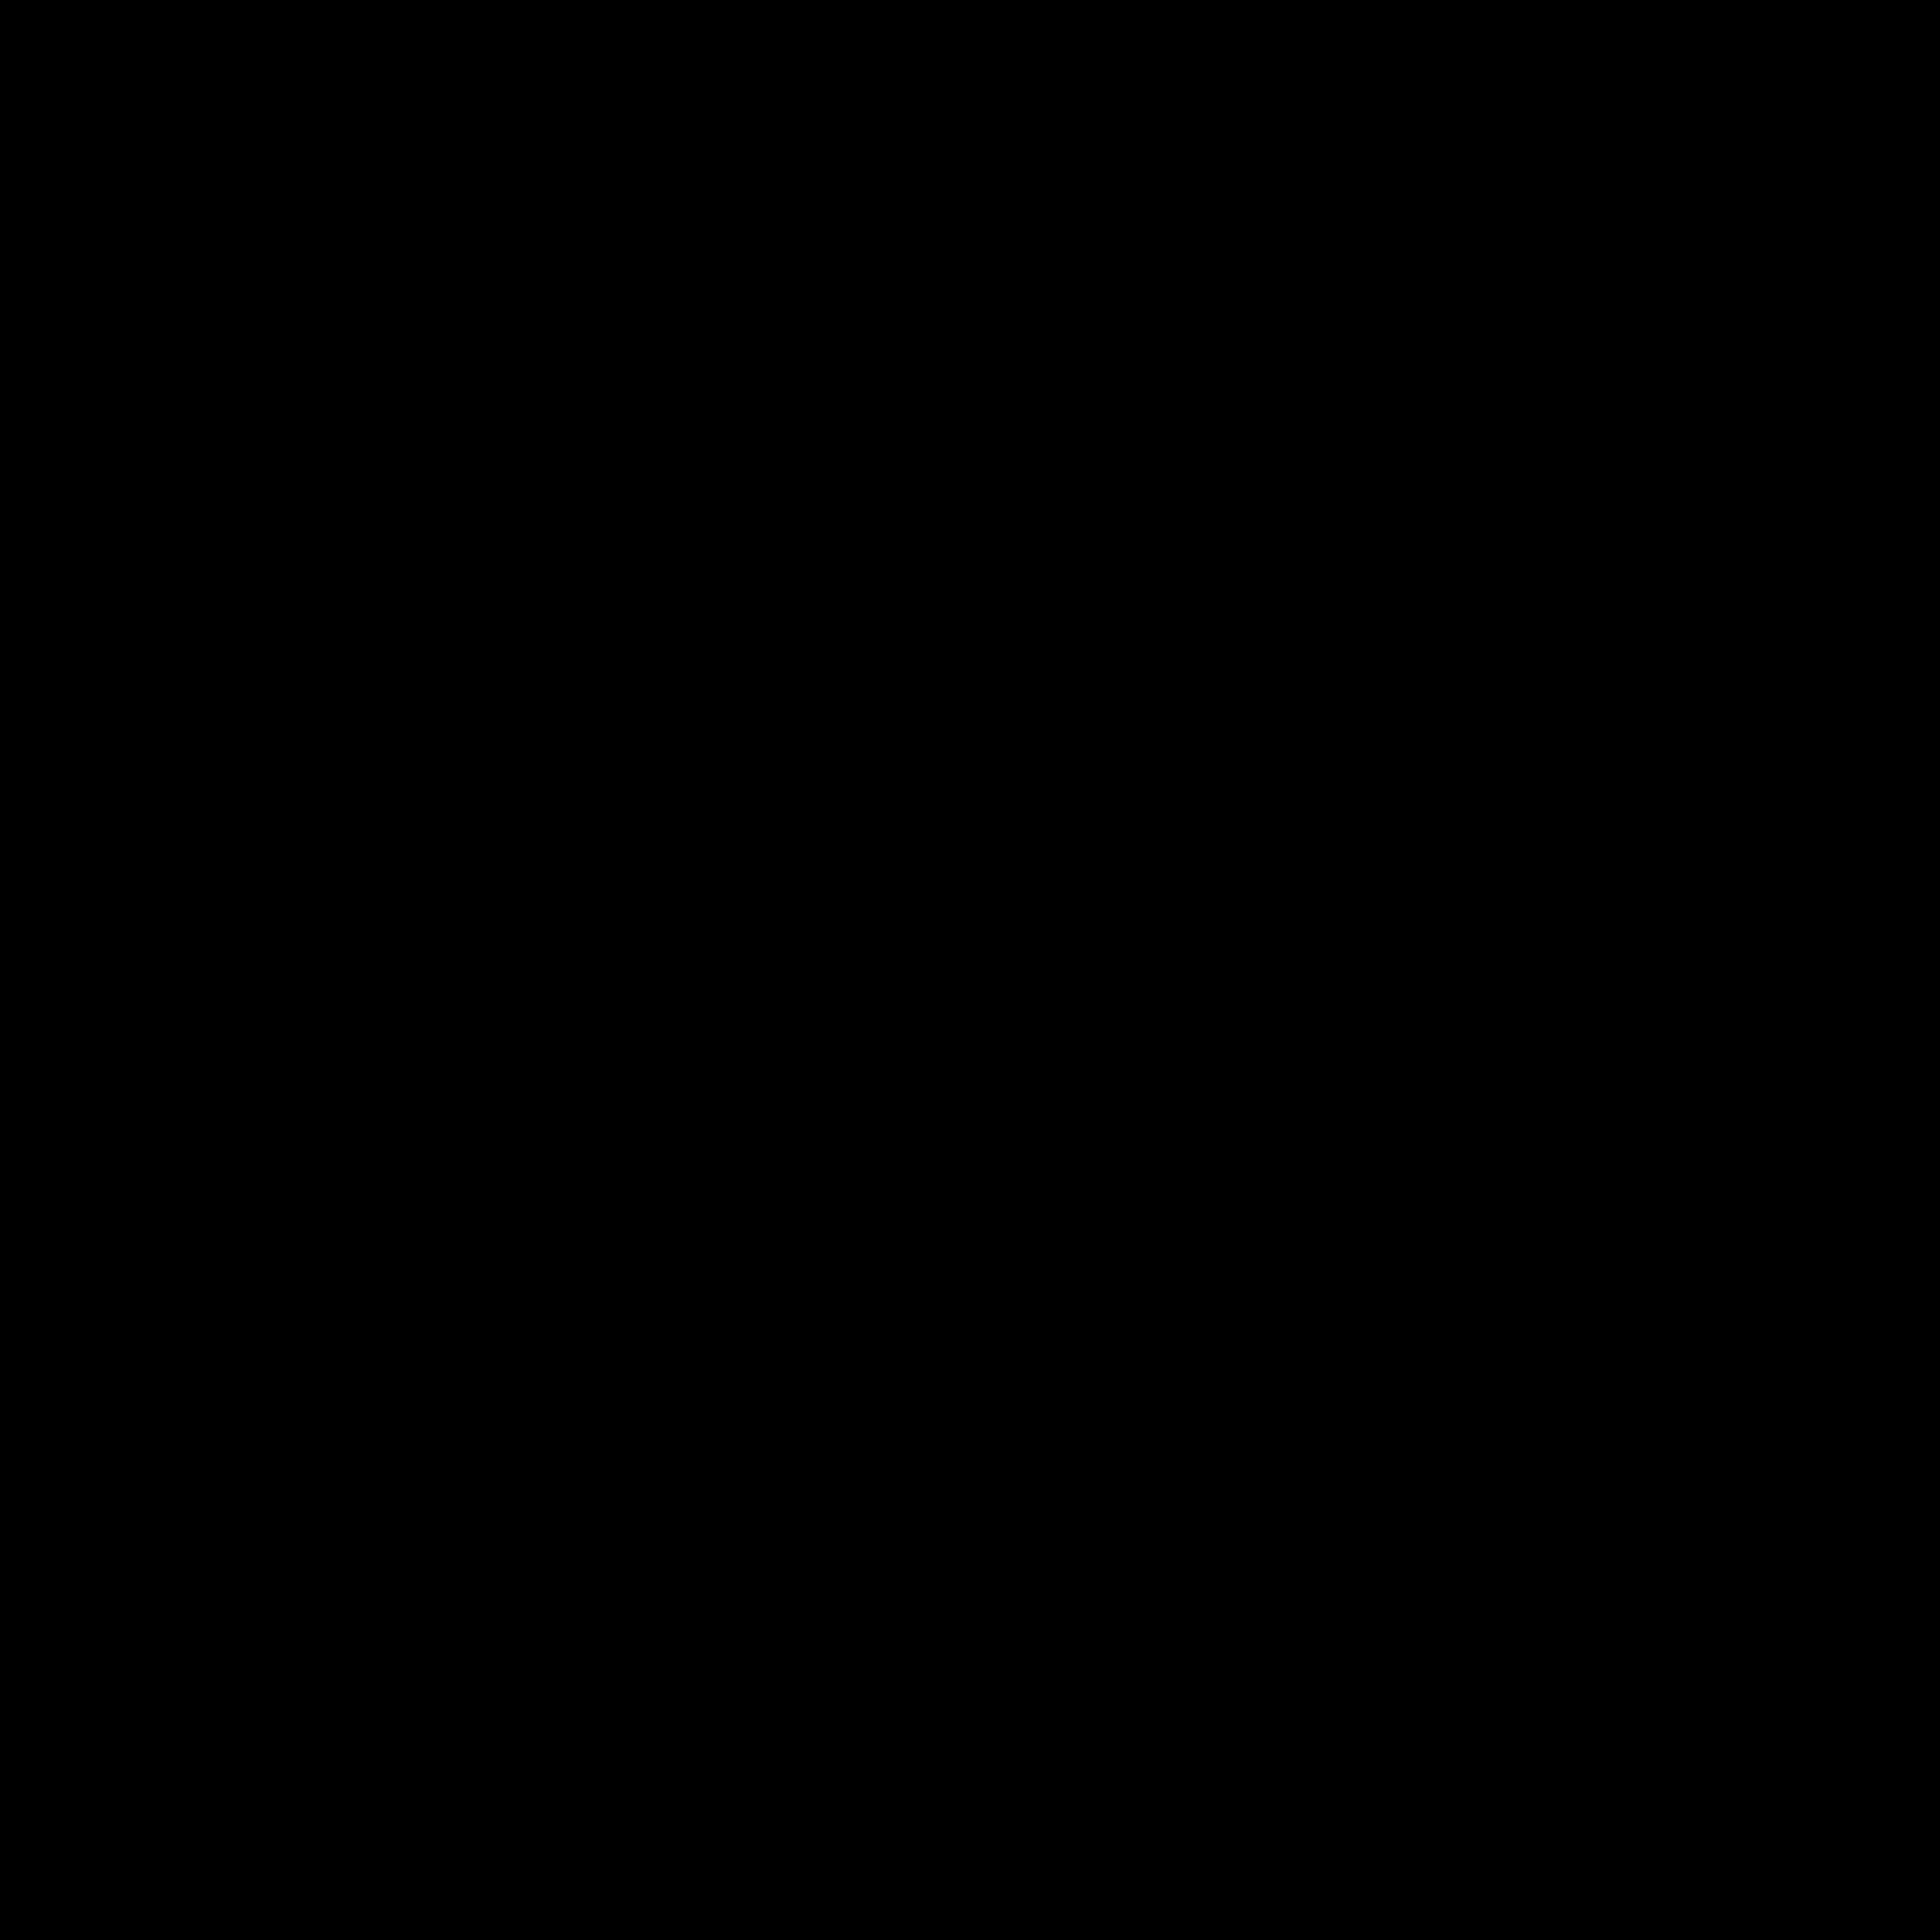 Freetoedit Blackline Line Straightline Lines Png Remixit In 2021 Overlays Transparent Black Background Wallpaper Image Stickers